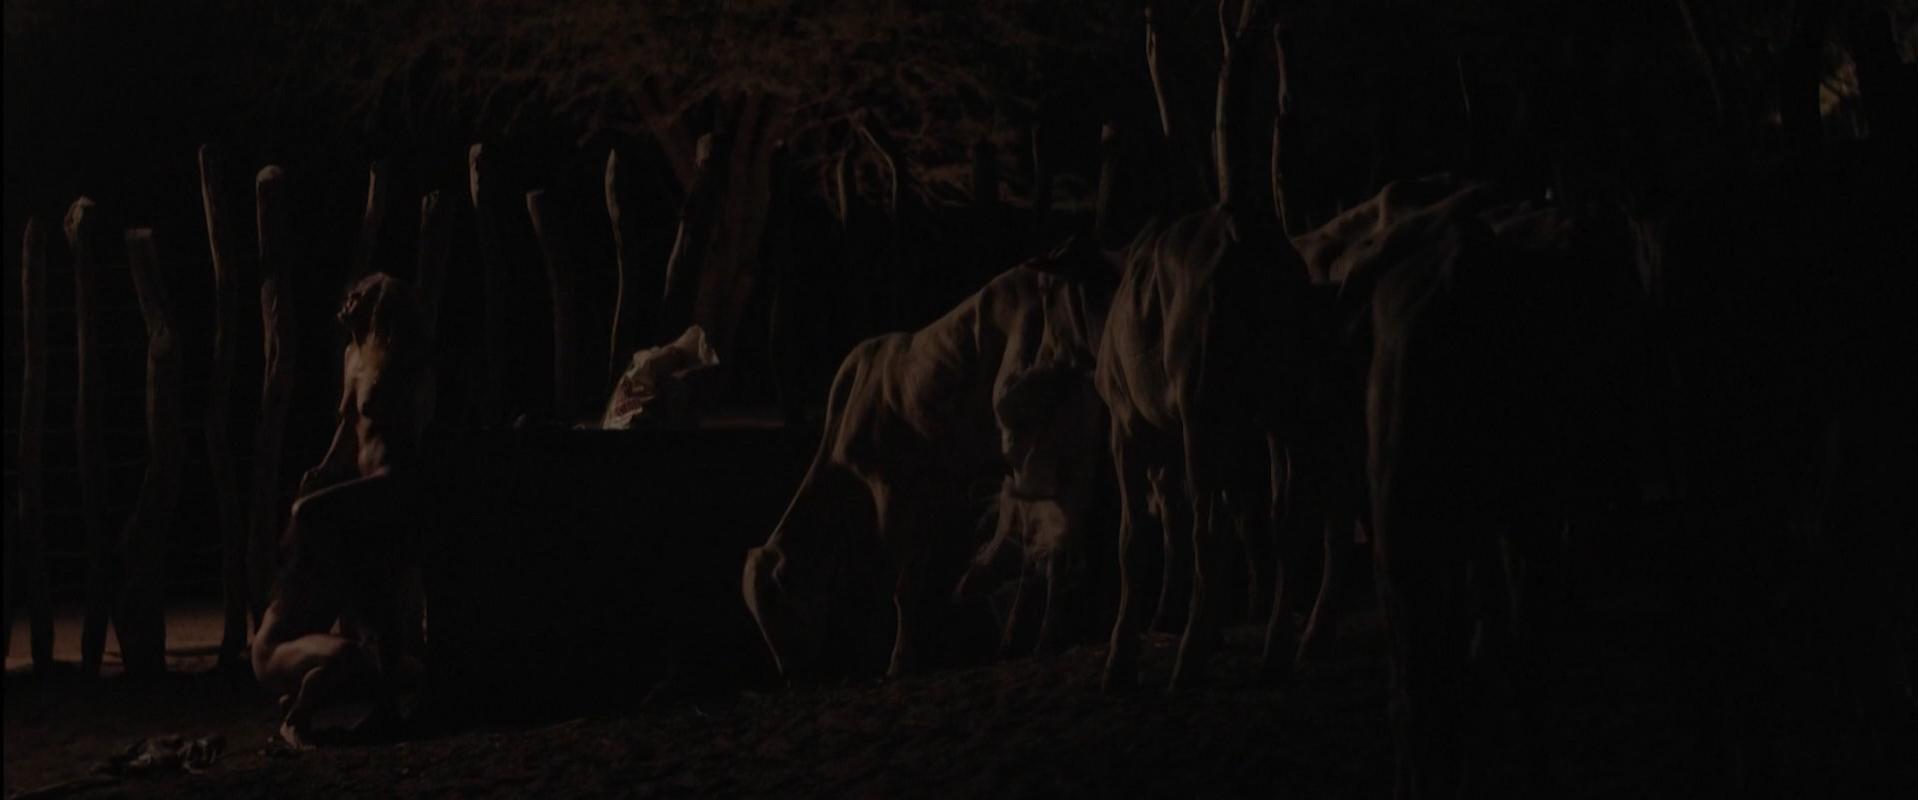 Maeve Jinkings nude - Boi neon (2015)